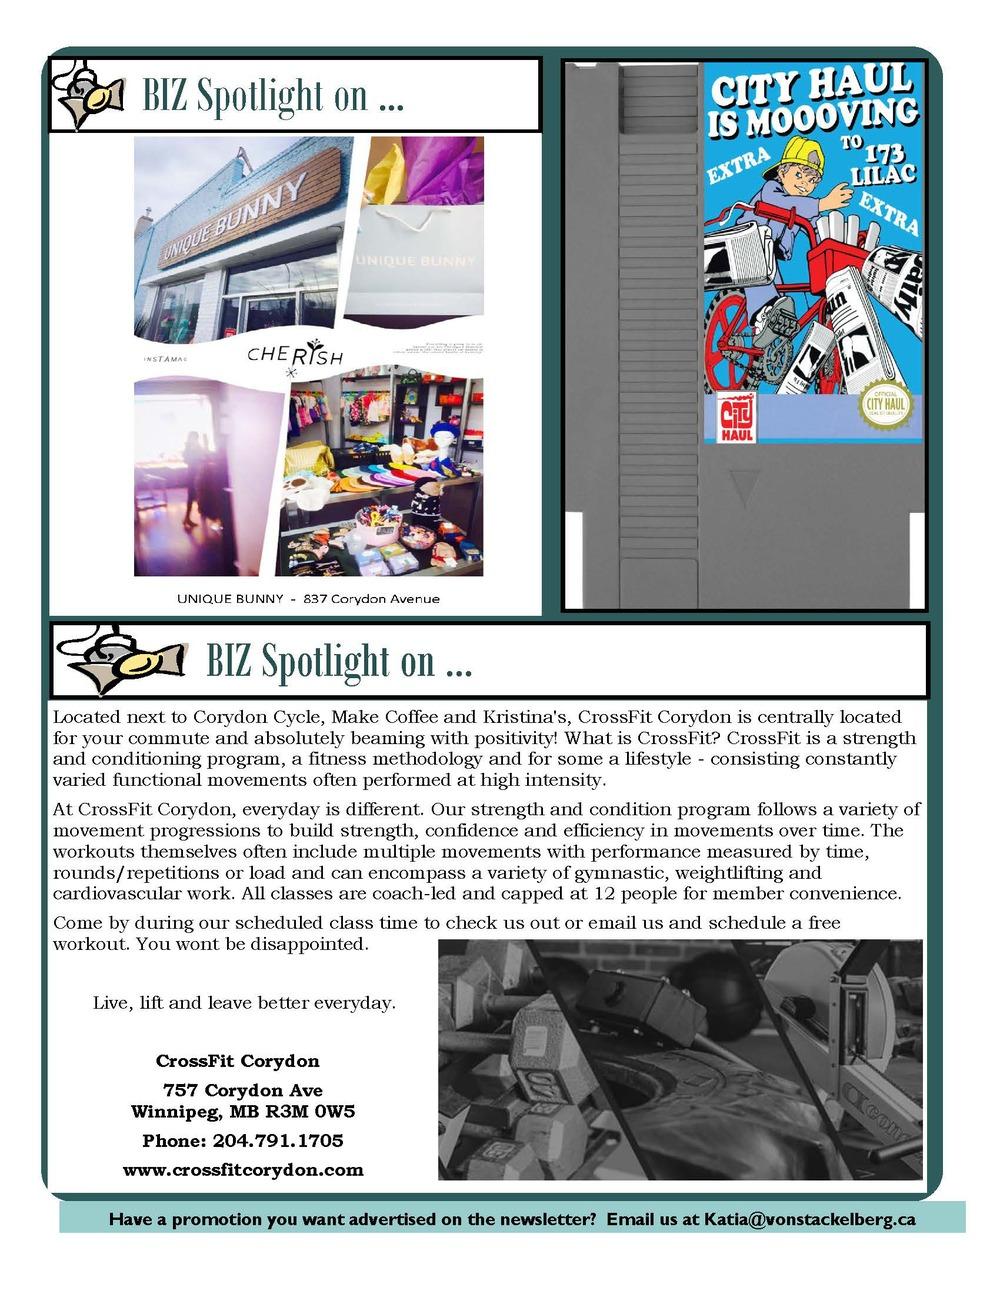 2015 - Corydon BIZ  Newsletter_Page_9.jpg